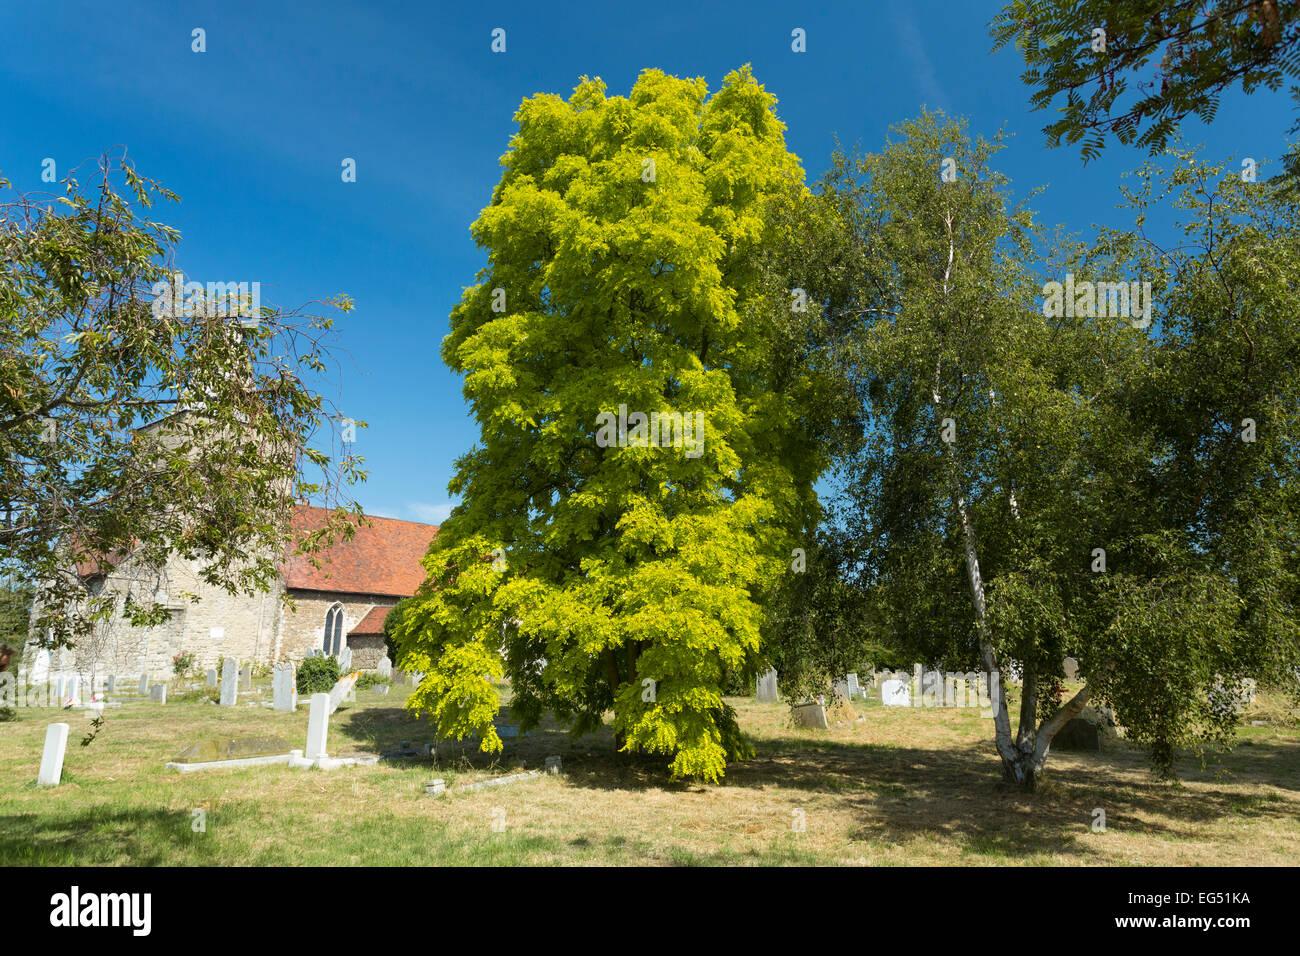 ash tree in the UK - Stock Image